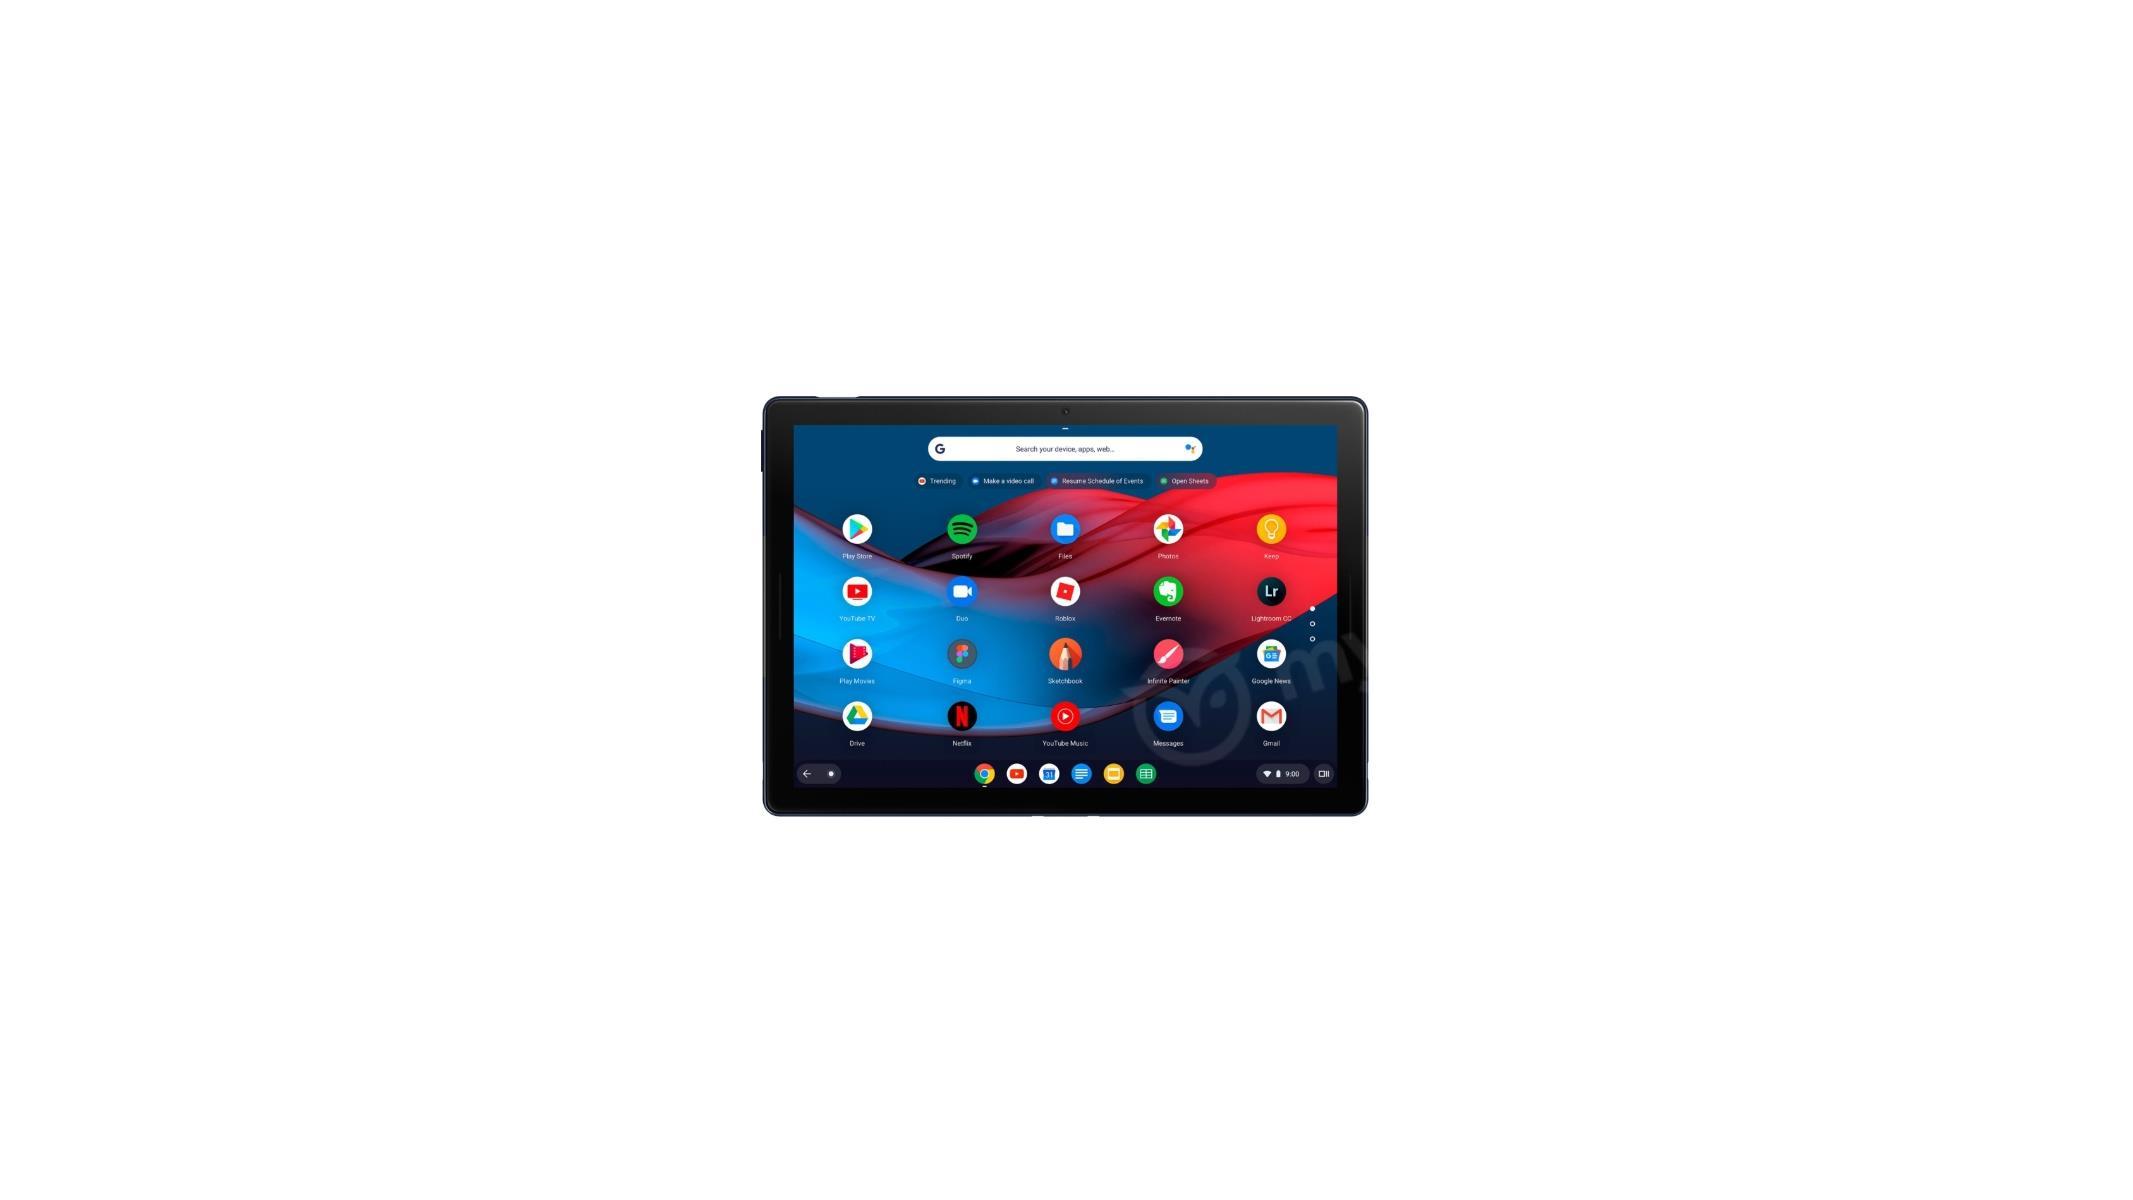 Google Pixel Slate Chrome OS Tablet Images Leak, Detachable